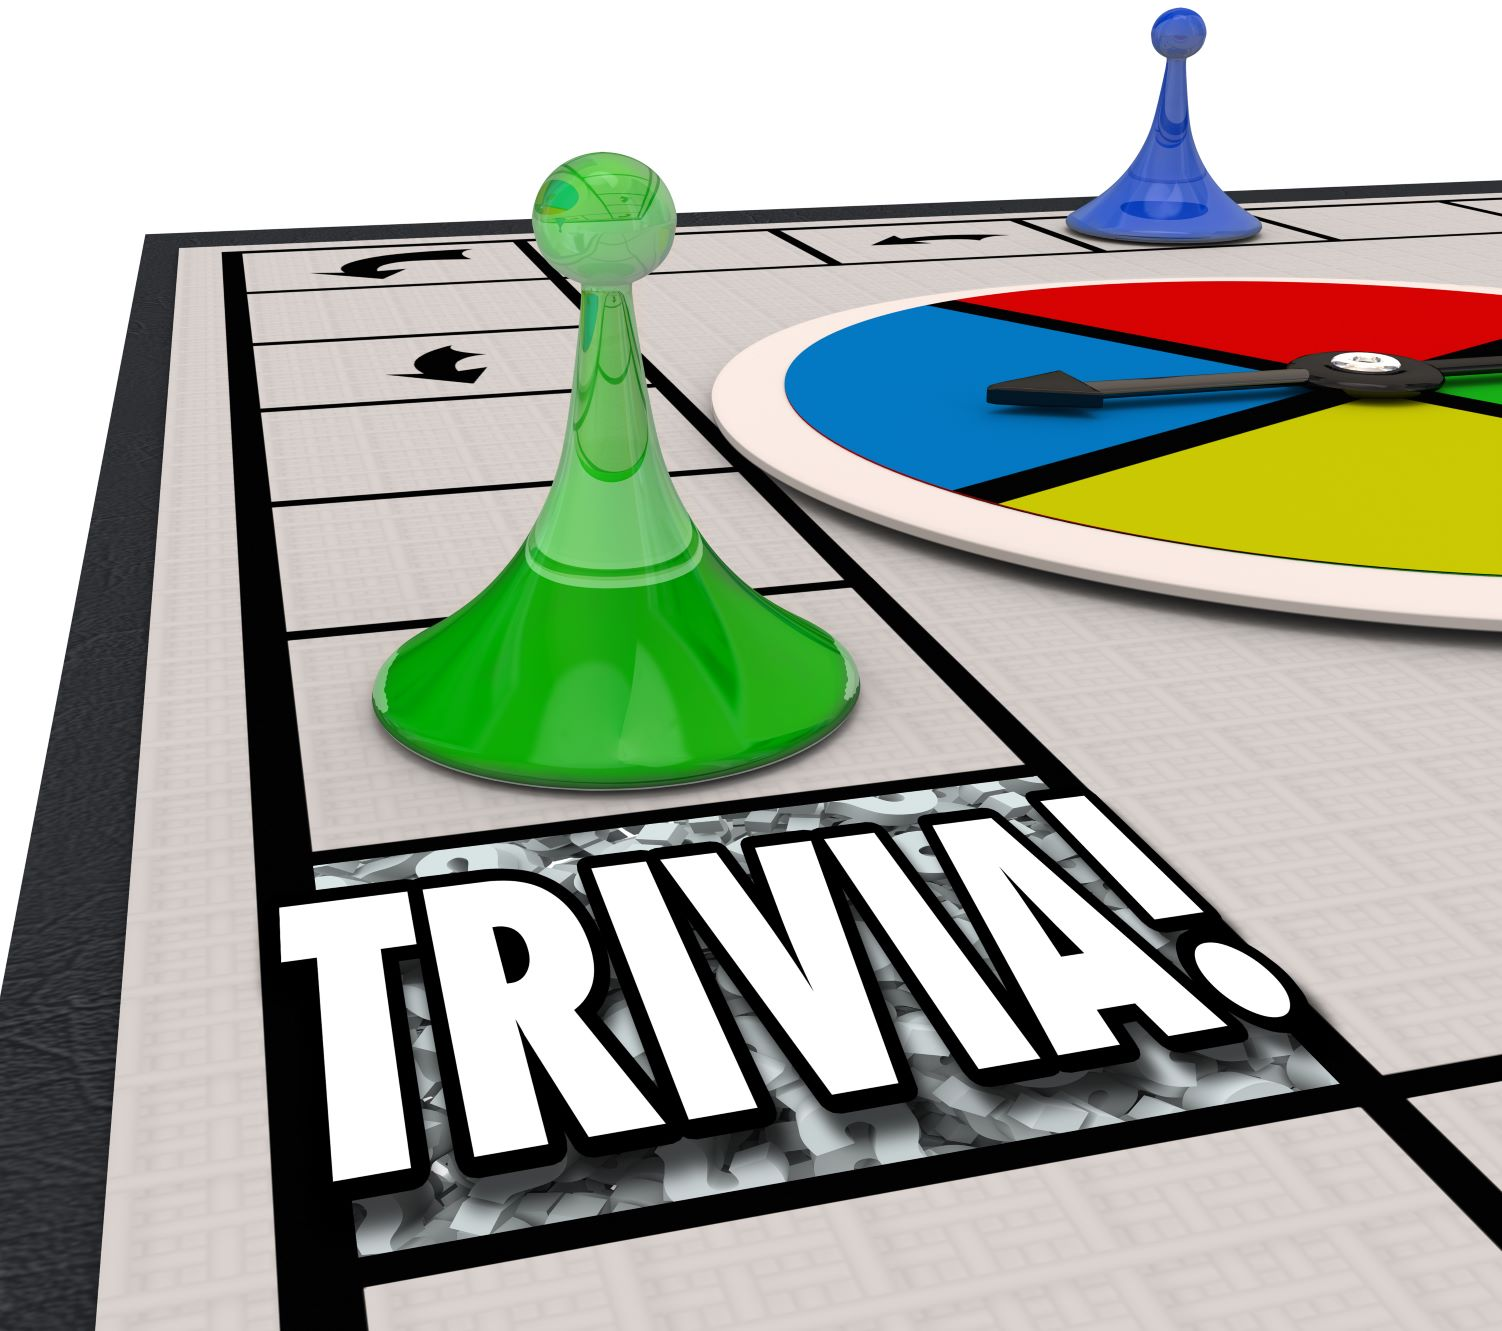 Online Games: Trivia Challenge!